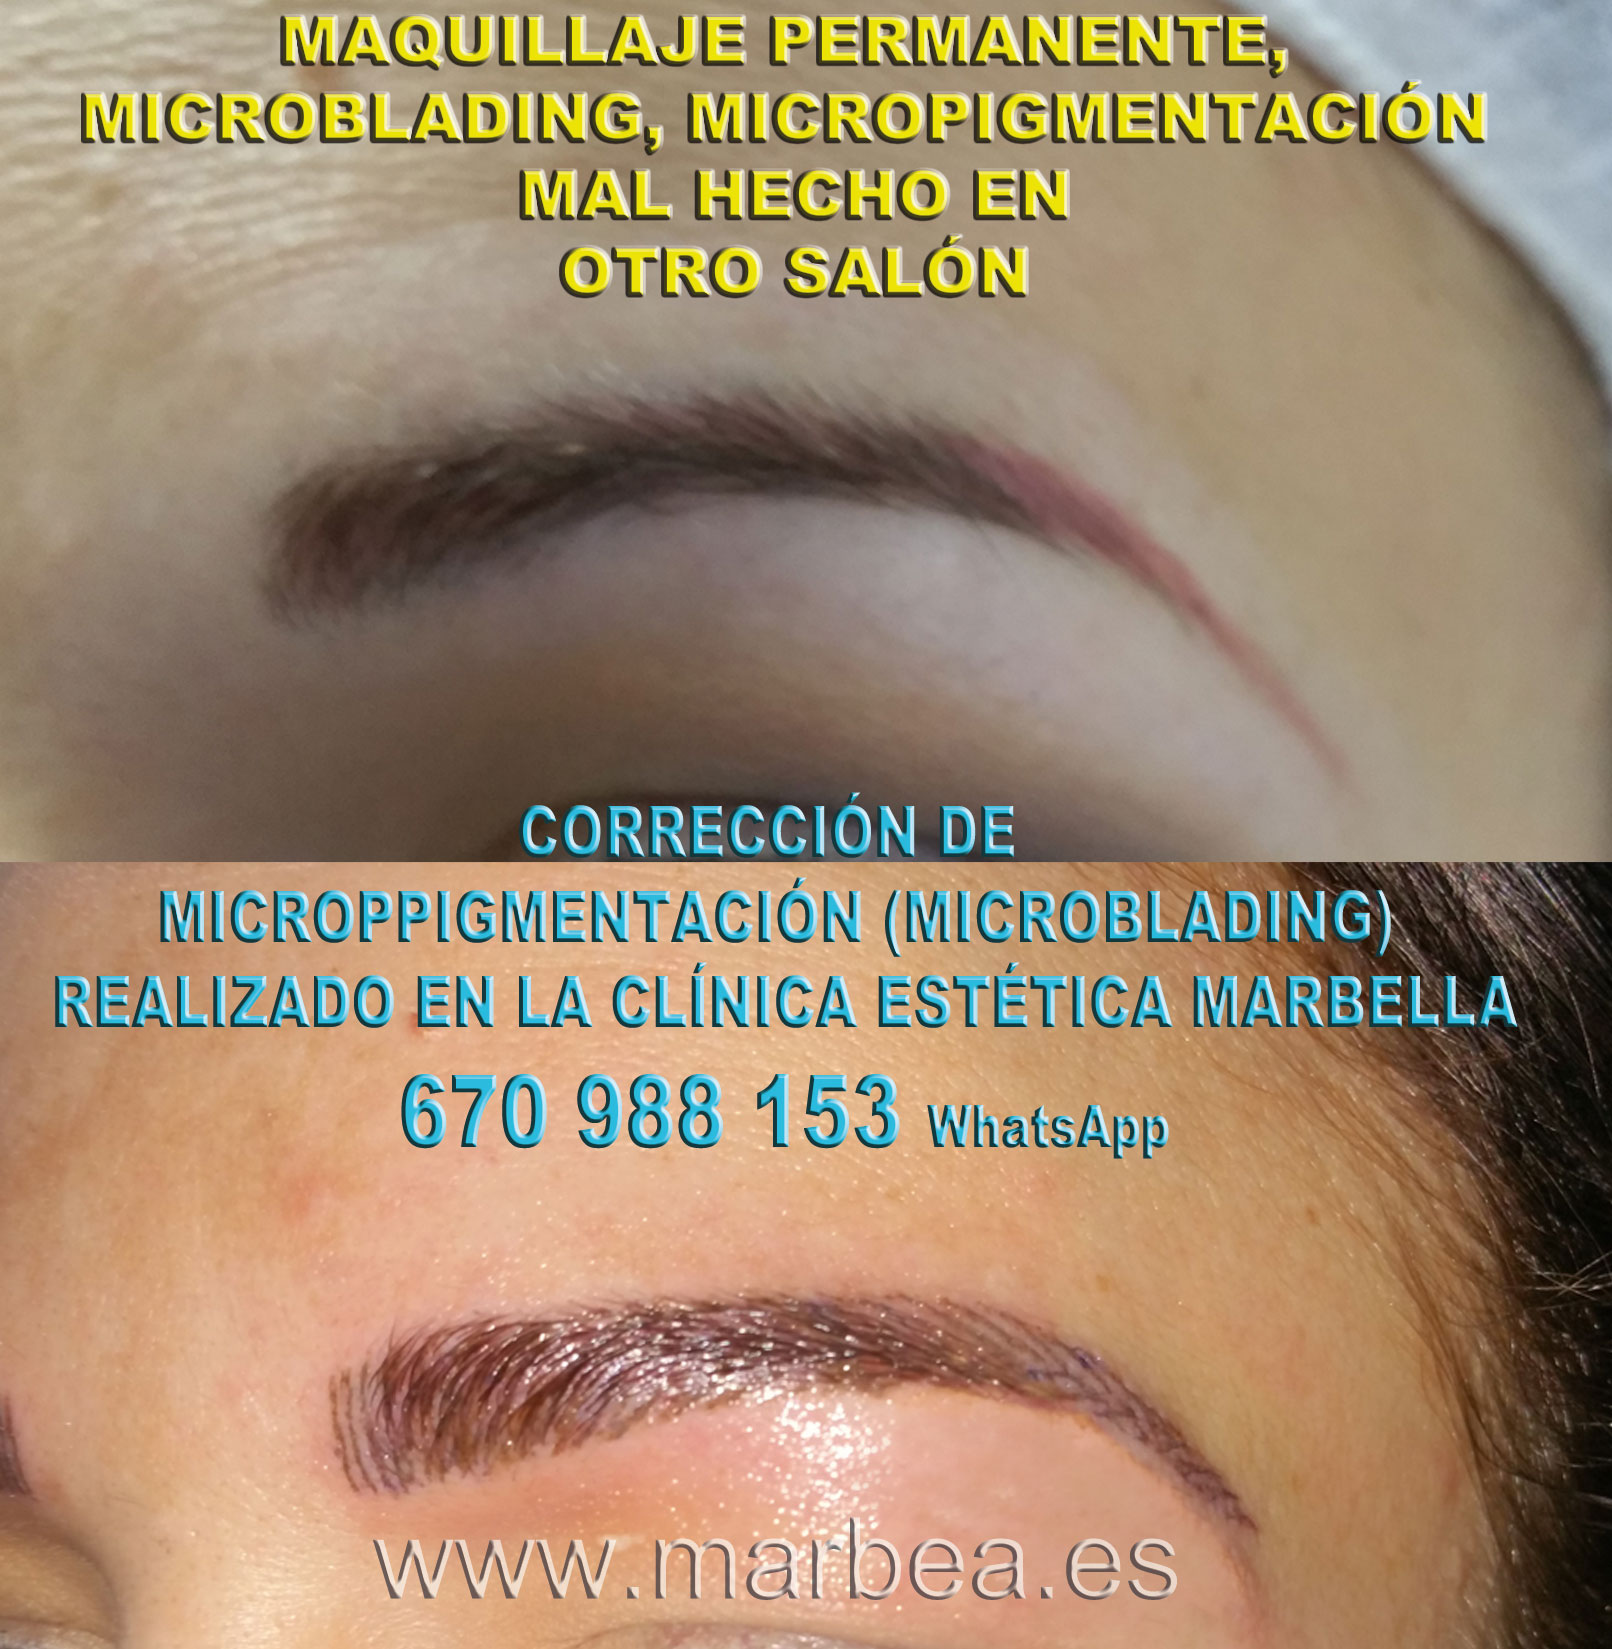 Borrar maquillaje permanente mal hecha clínica estética maquillaje permanete entrega micropigmentacion correctiva de cejas,corregir micropigmentación no deseada